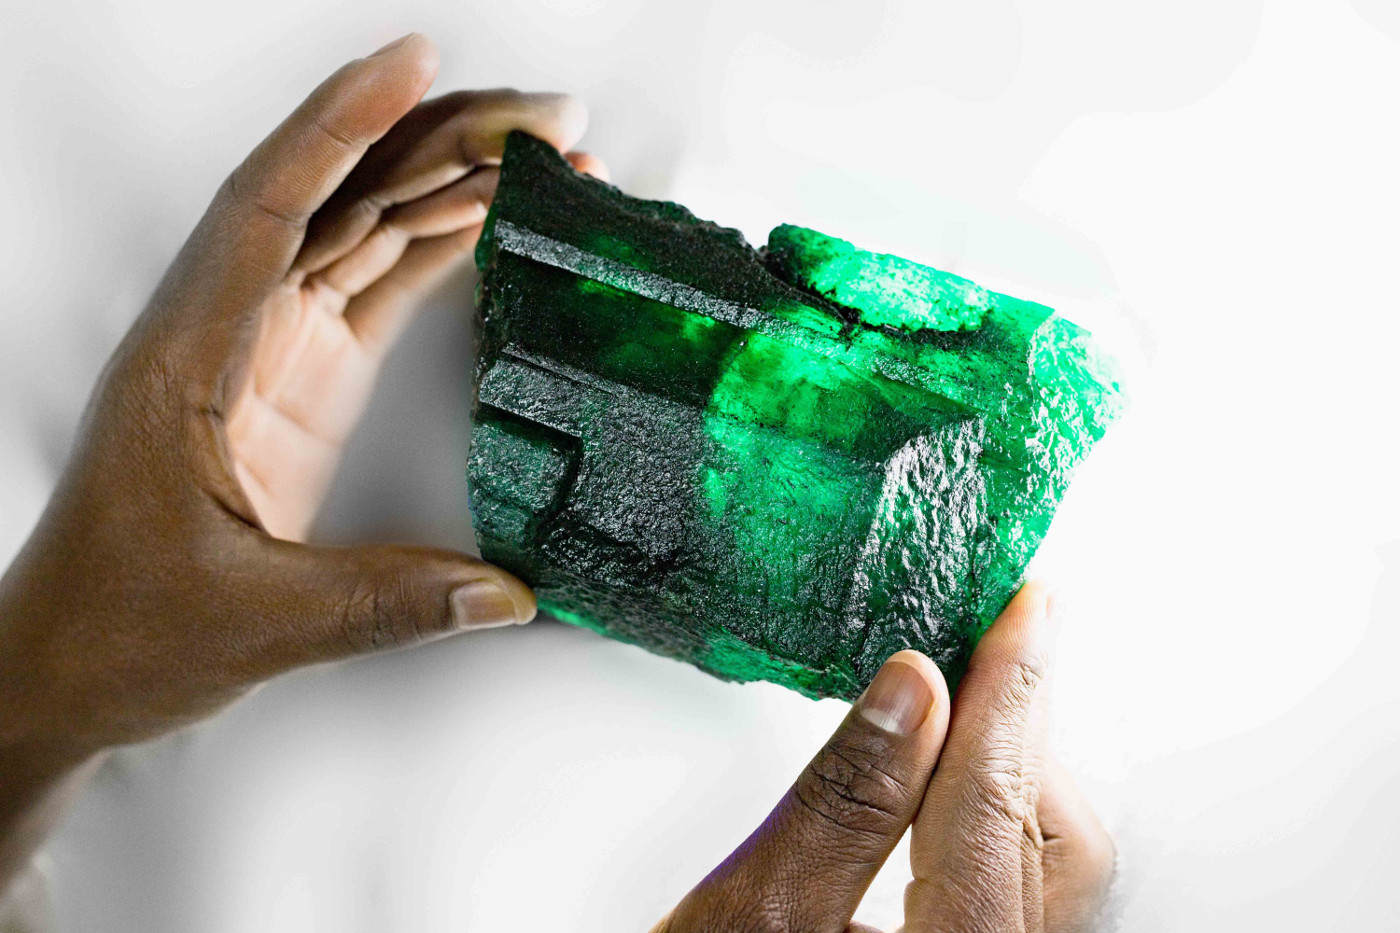 Gemfields Inkalamu Lion Emerald - Image 1